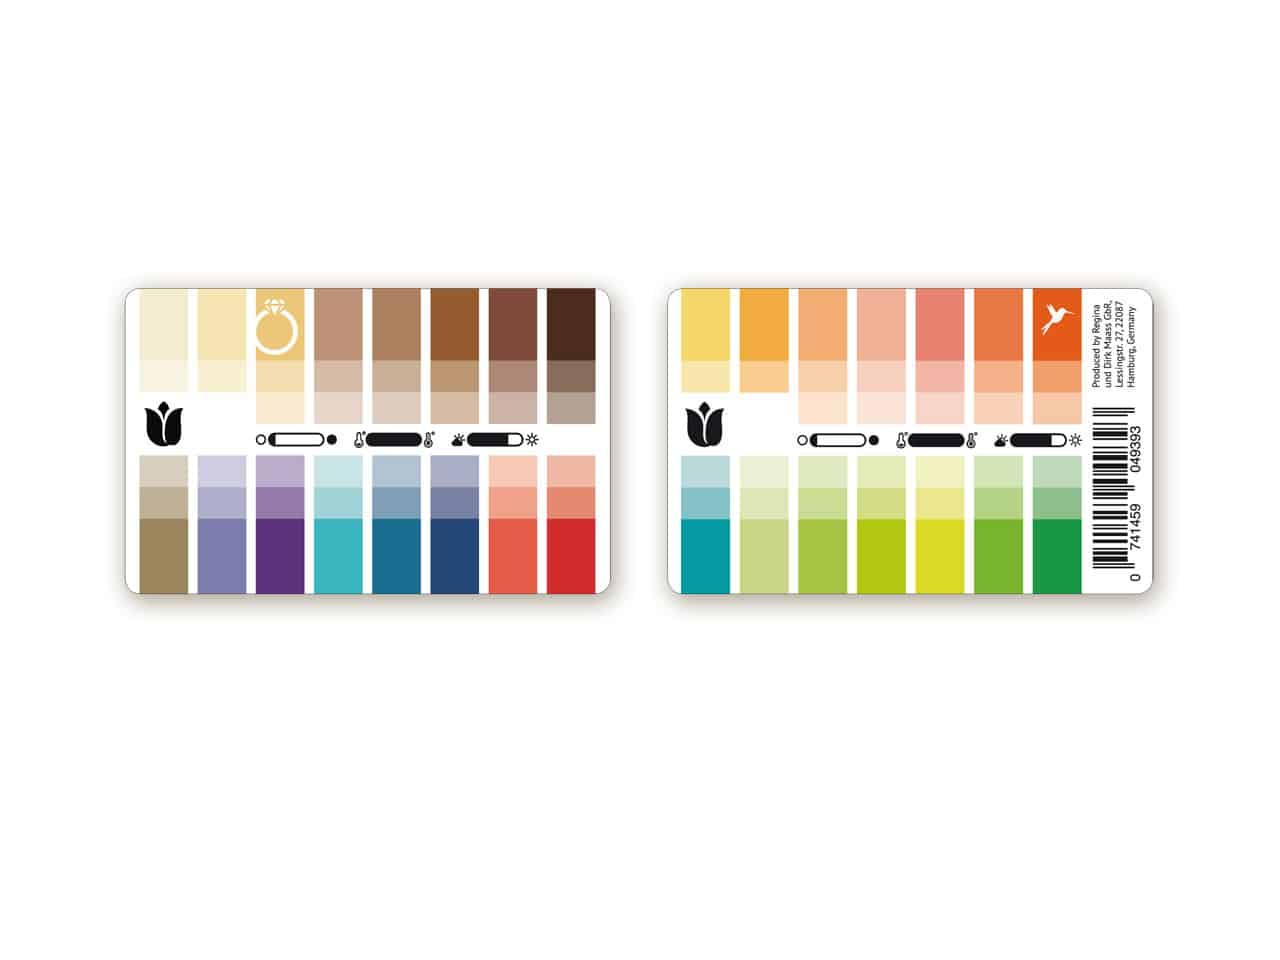 Farbtyp Frühling Farbpass als Plastikkarte